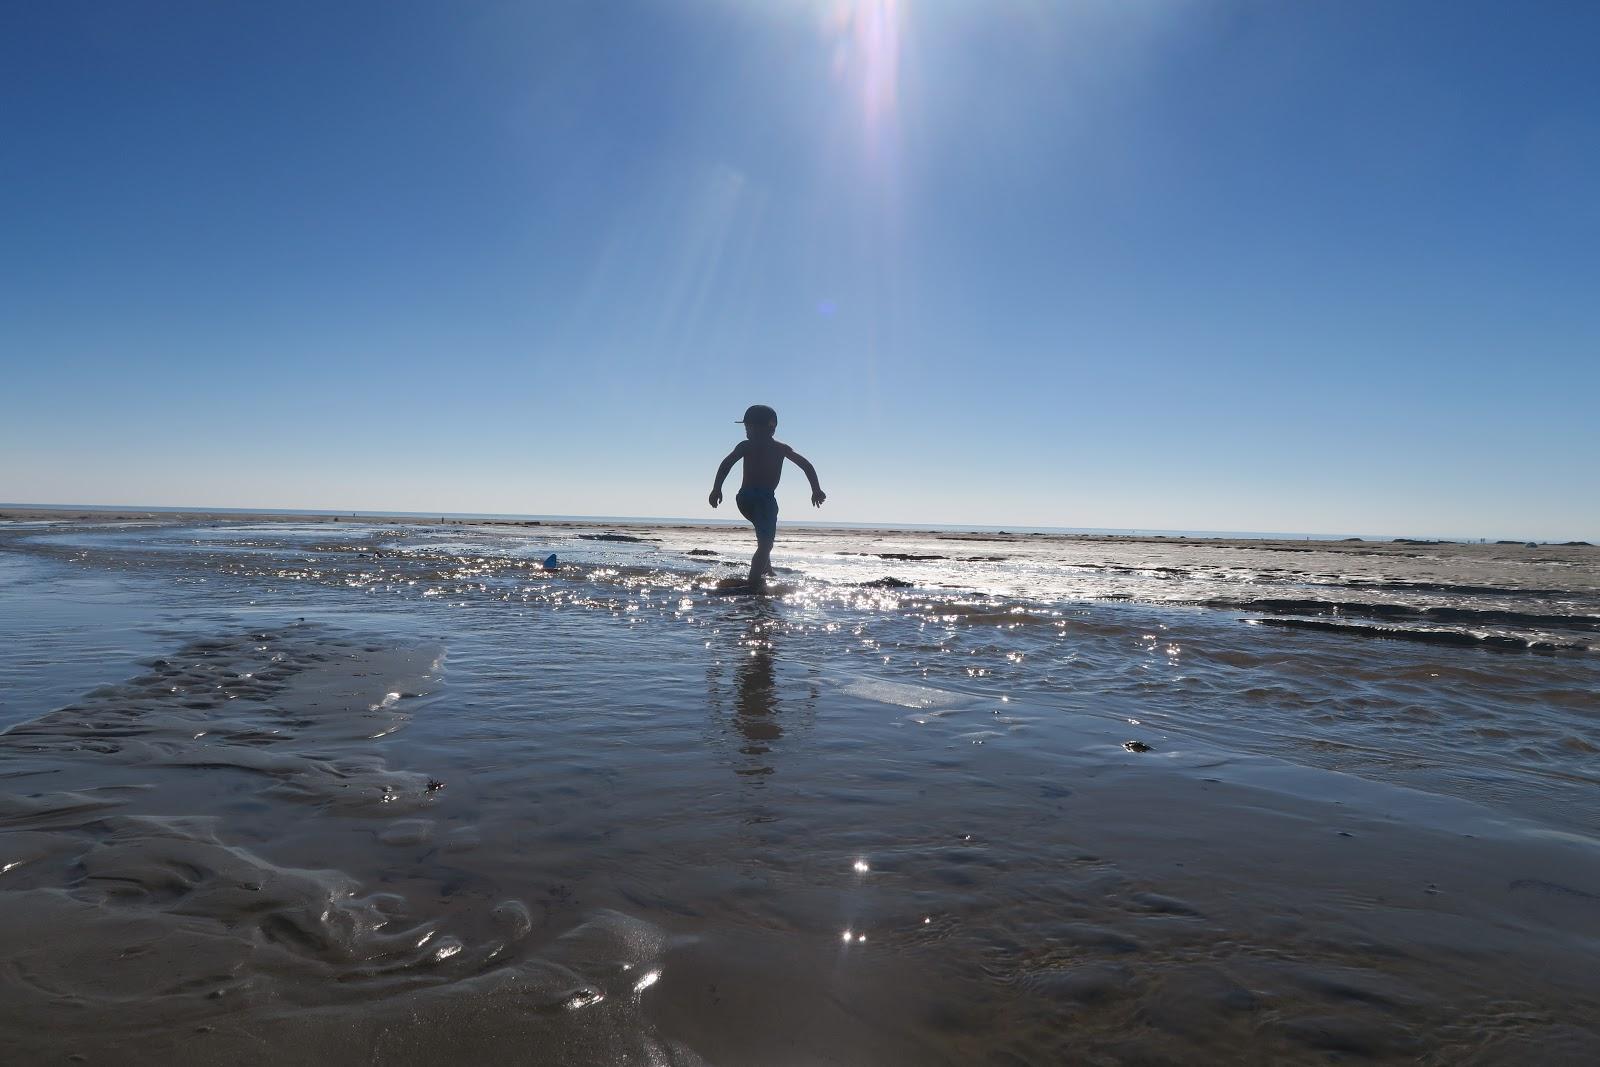 blackrock sands beach